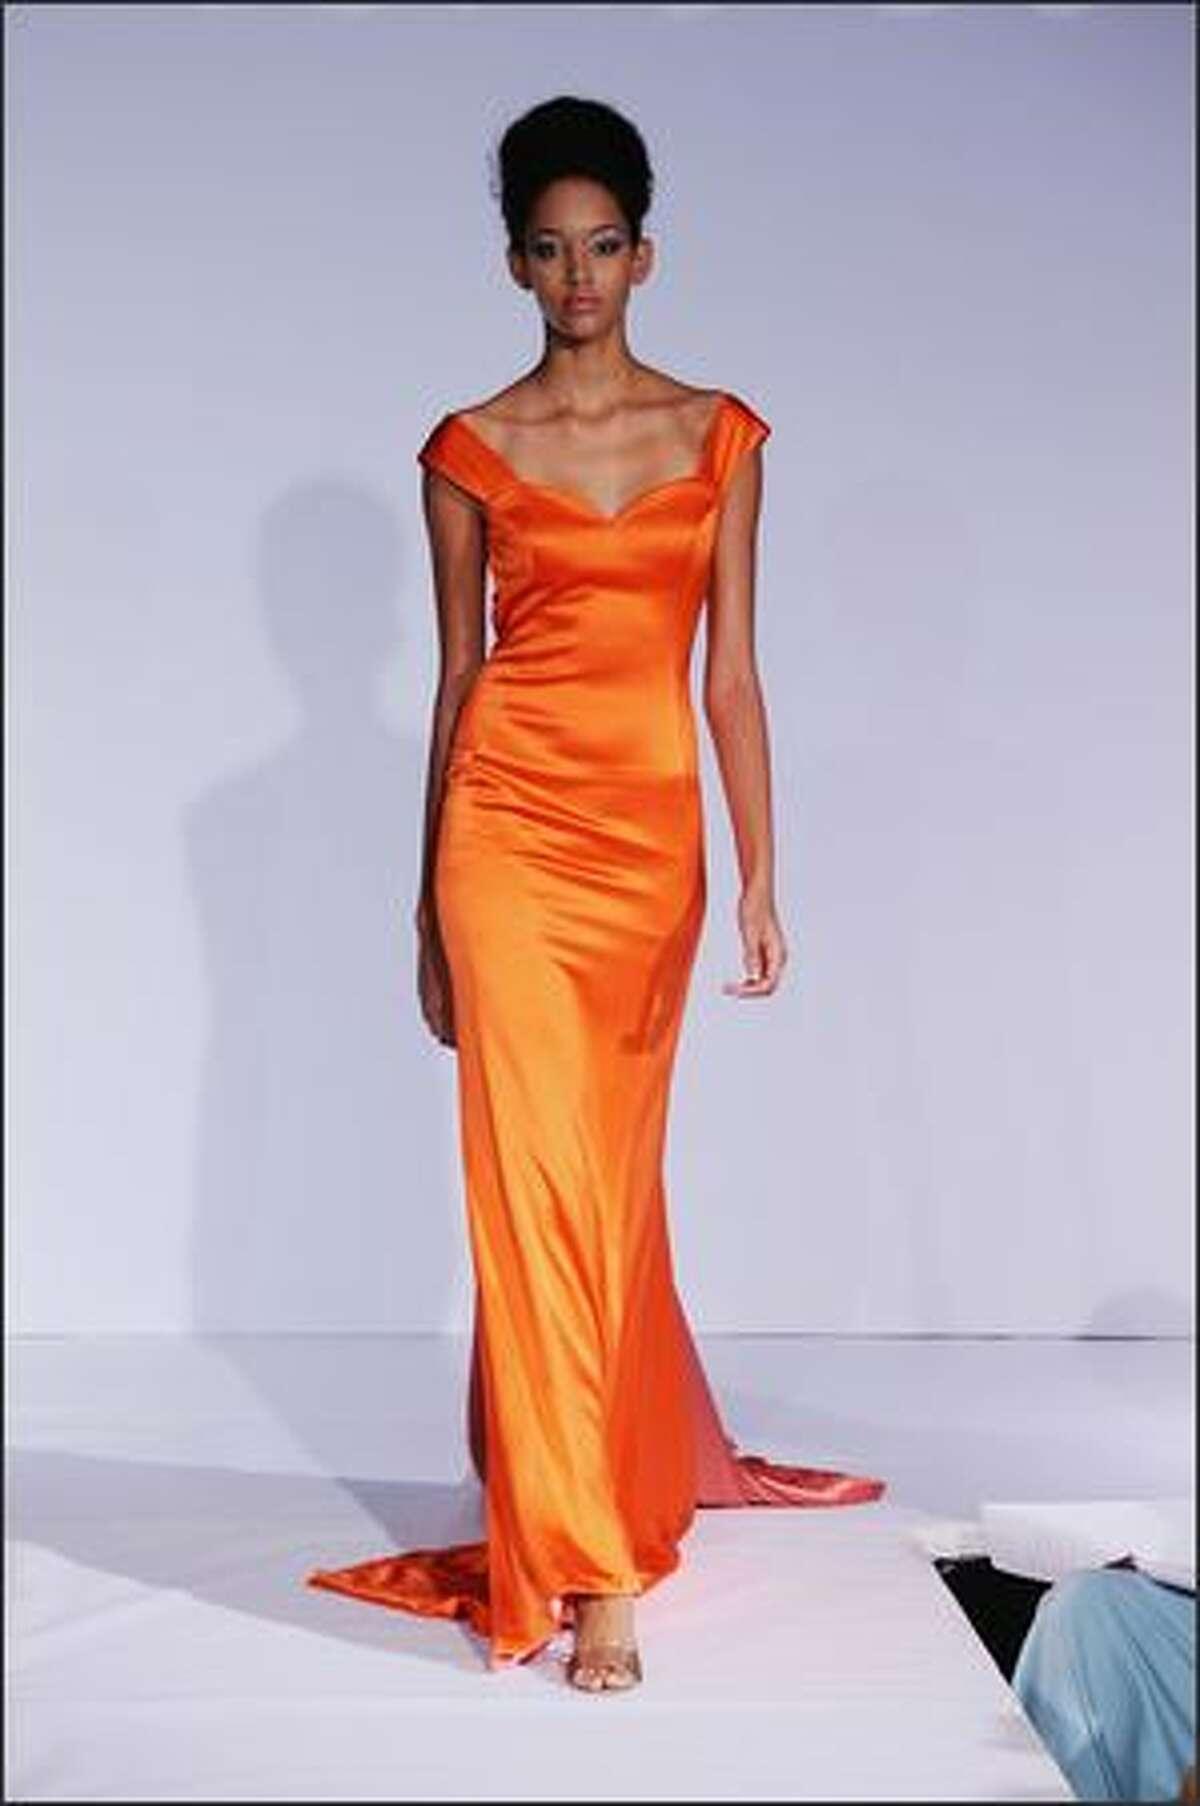 A model walks the runway at the B Michael show.